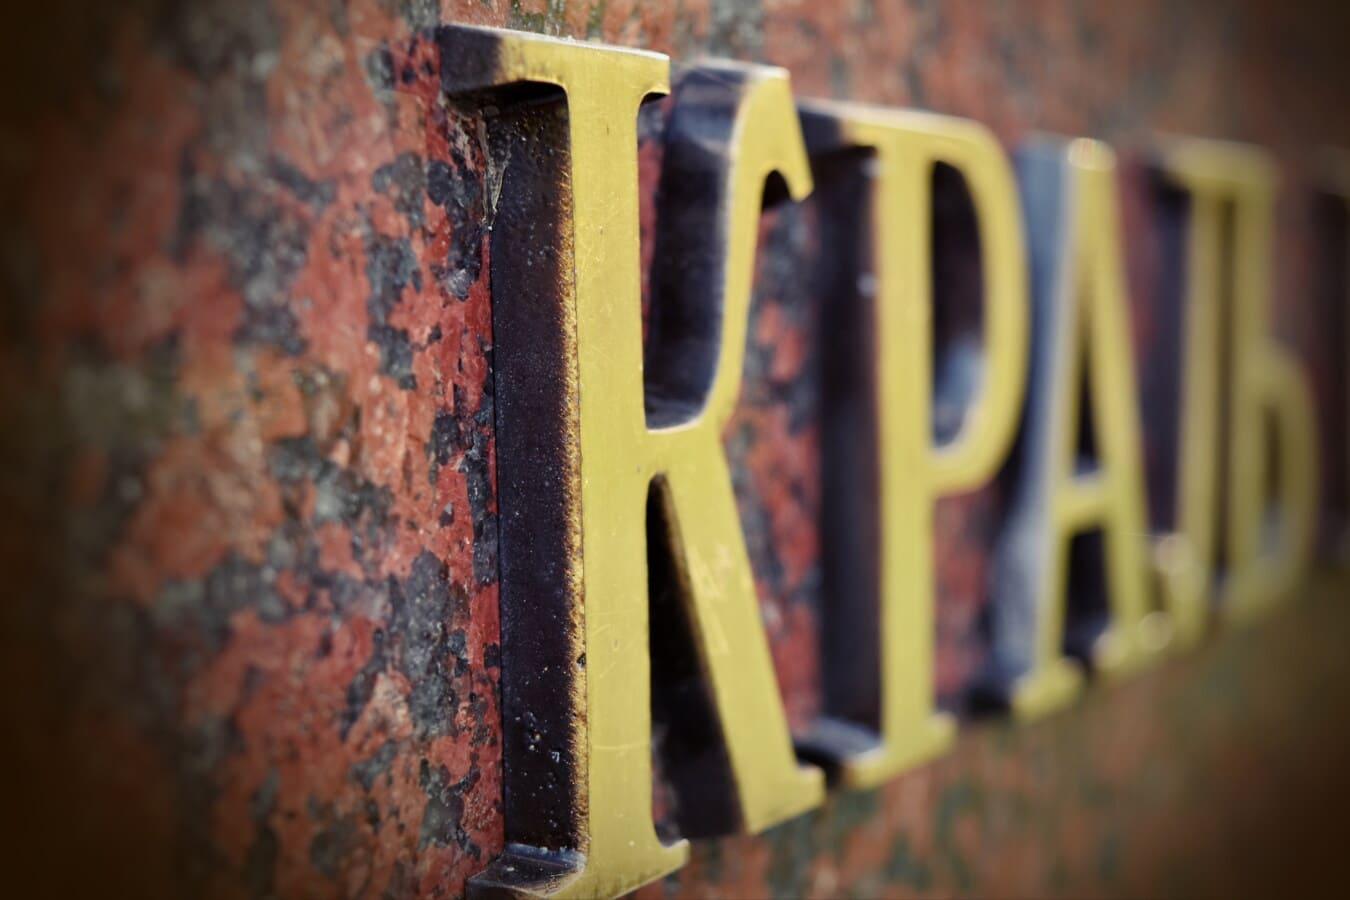 text, alphabet, cyrillic, metallic, marble, brass, metal, old, vintage, retro